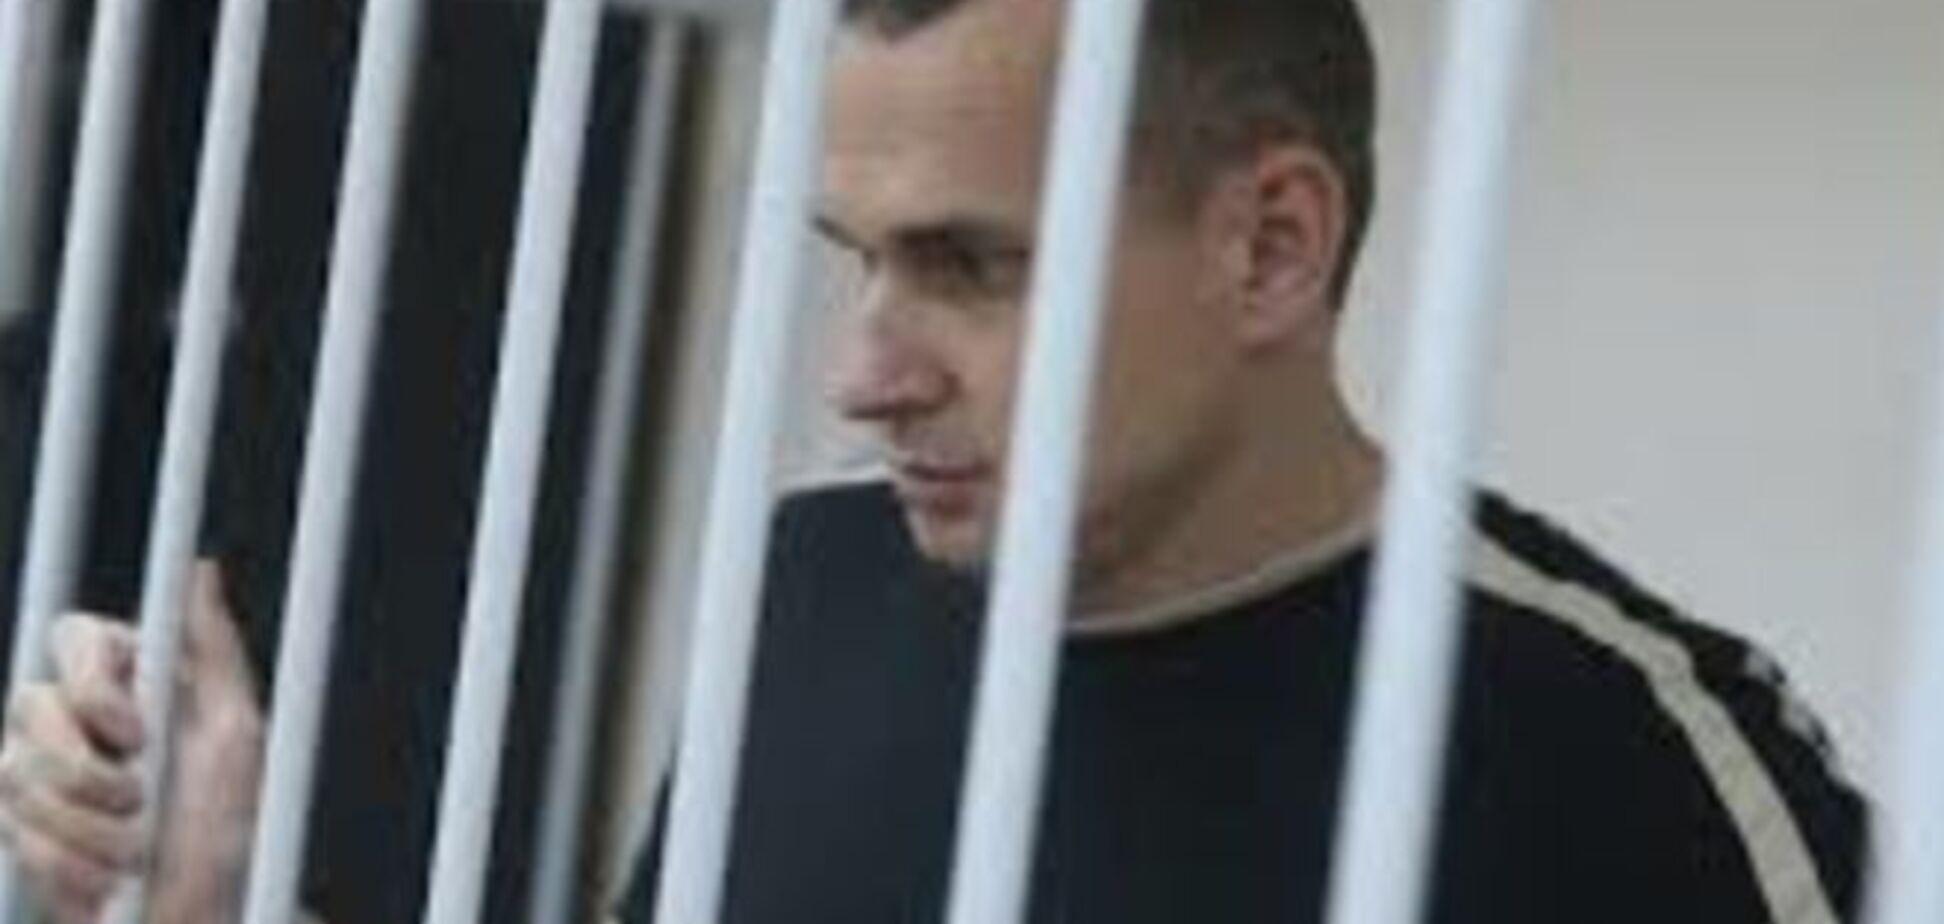 Сенцову продили арест еще на месяц